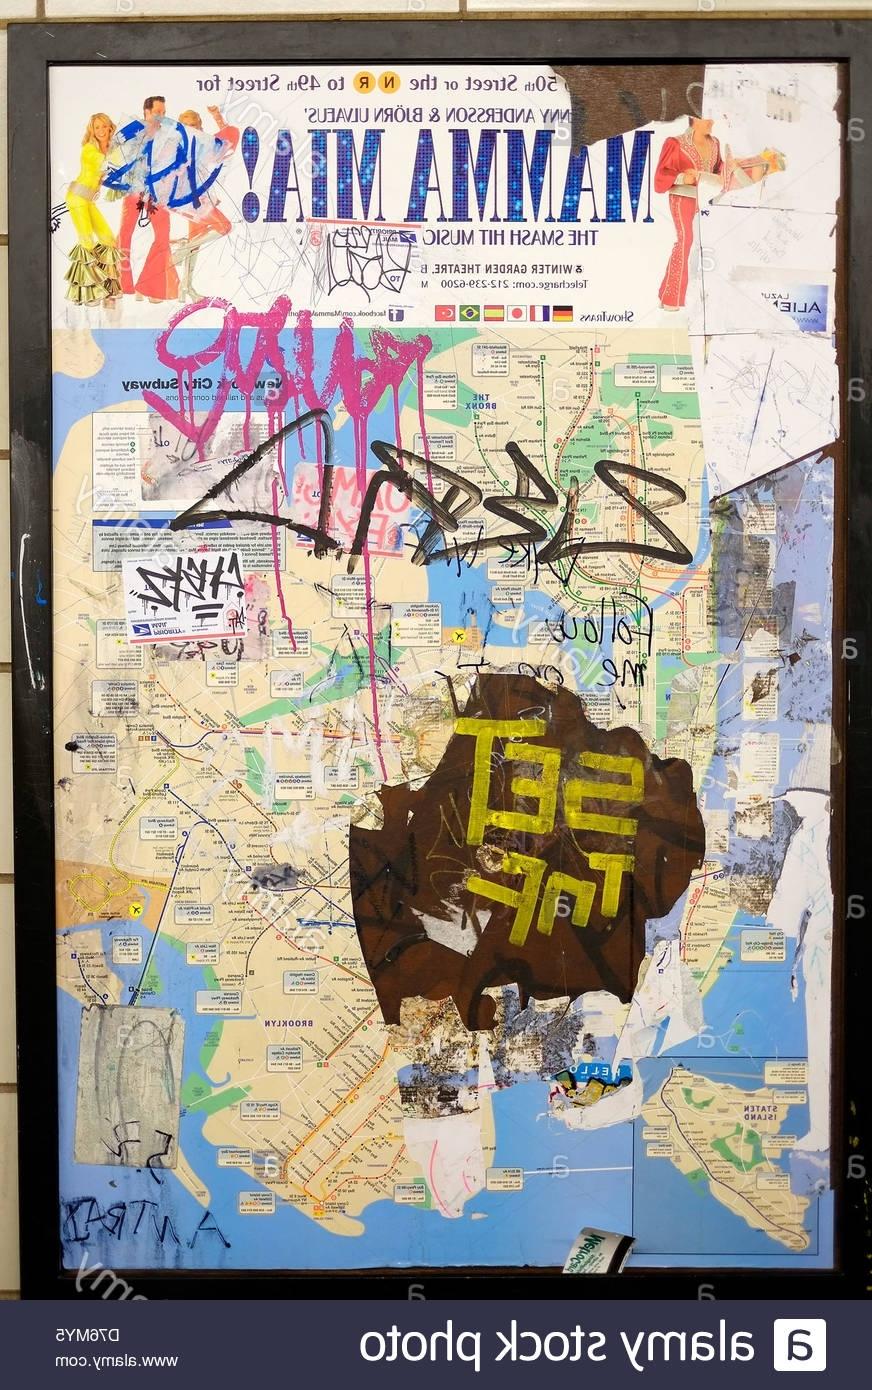 Nyc Subway Map Pics Stock.2019 Latest Nyc Subway Map Wall Art